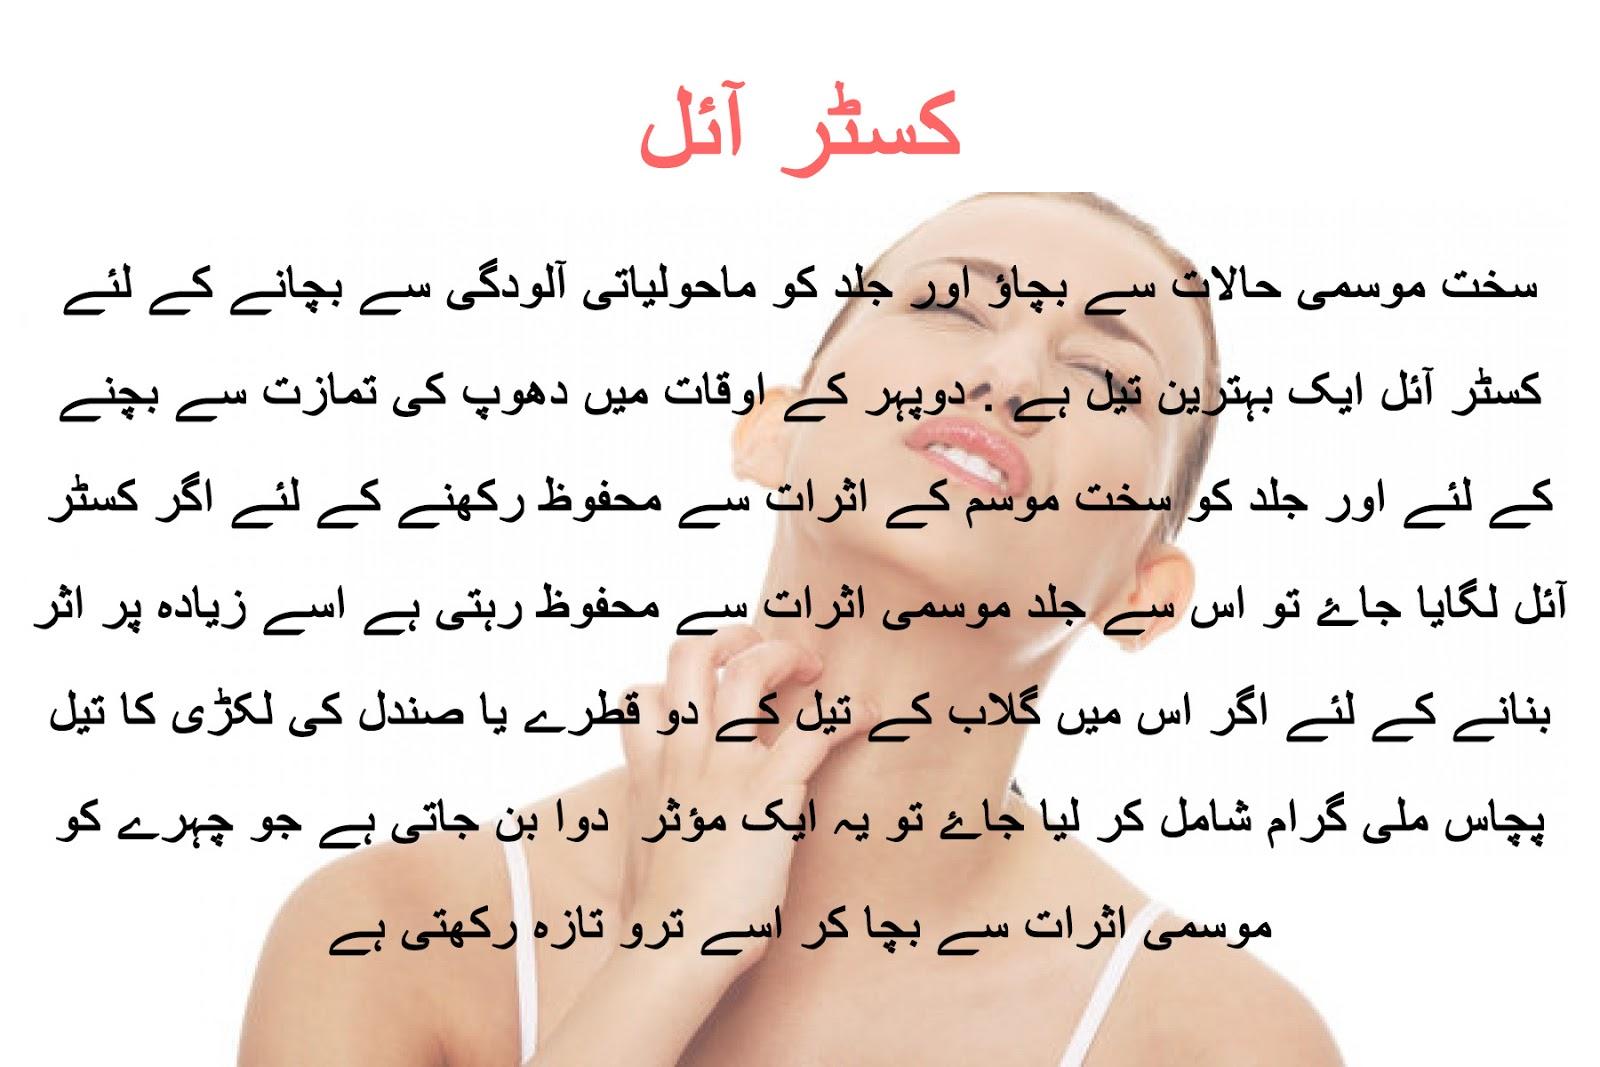 castor oil benefits for skin in urdu/hindi - Urdu Totke